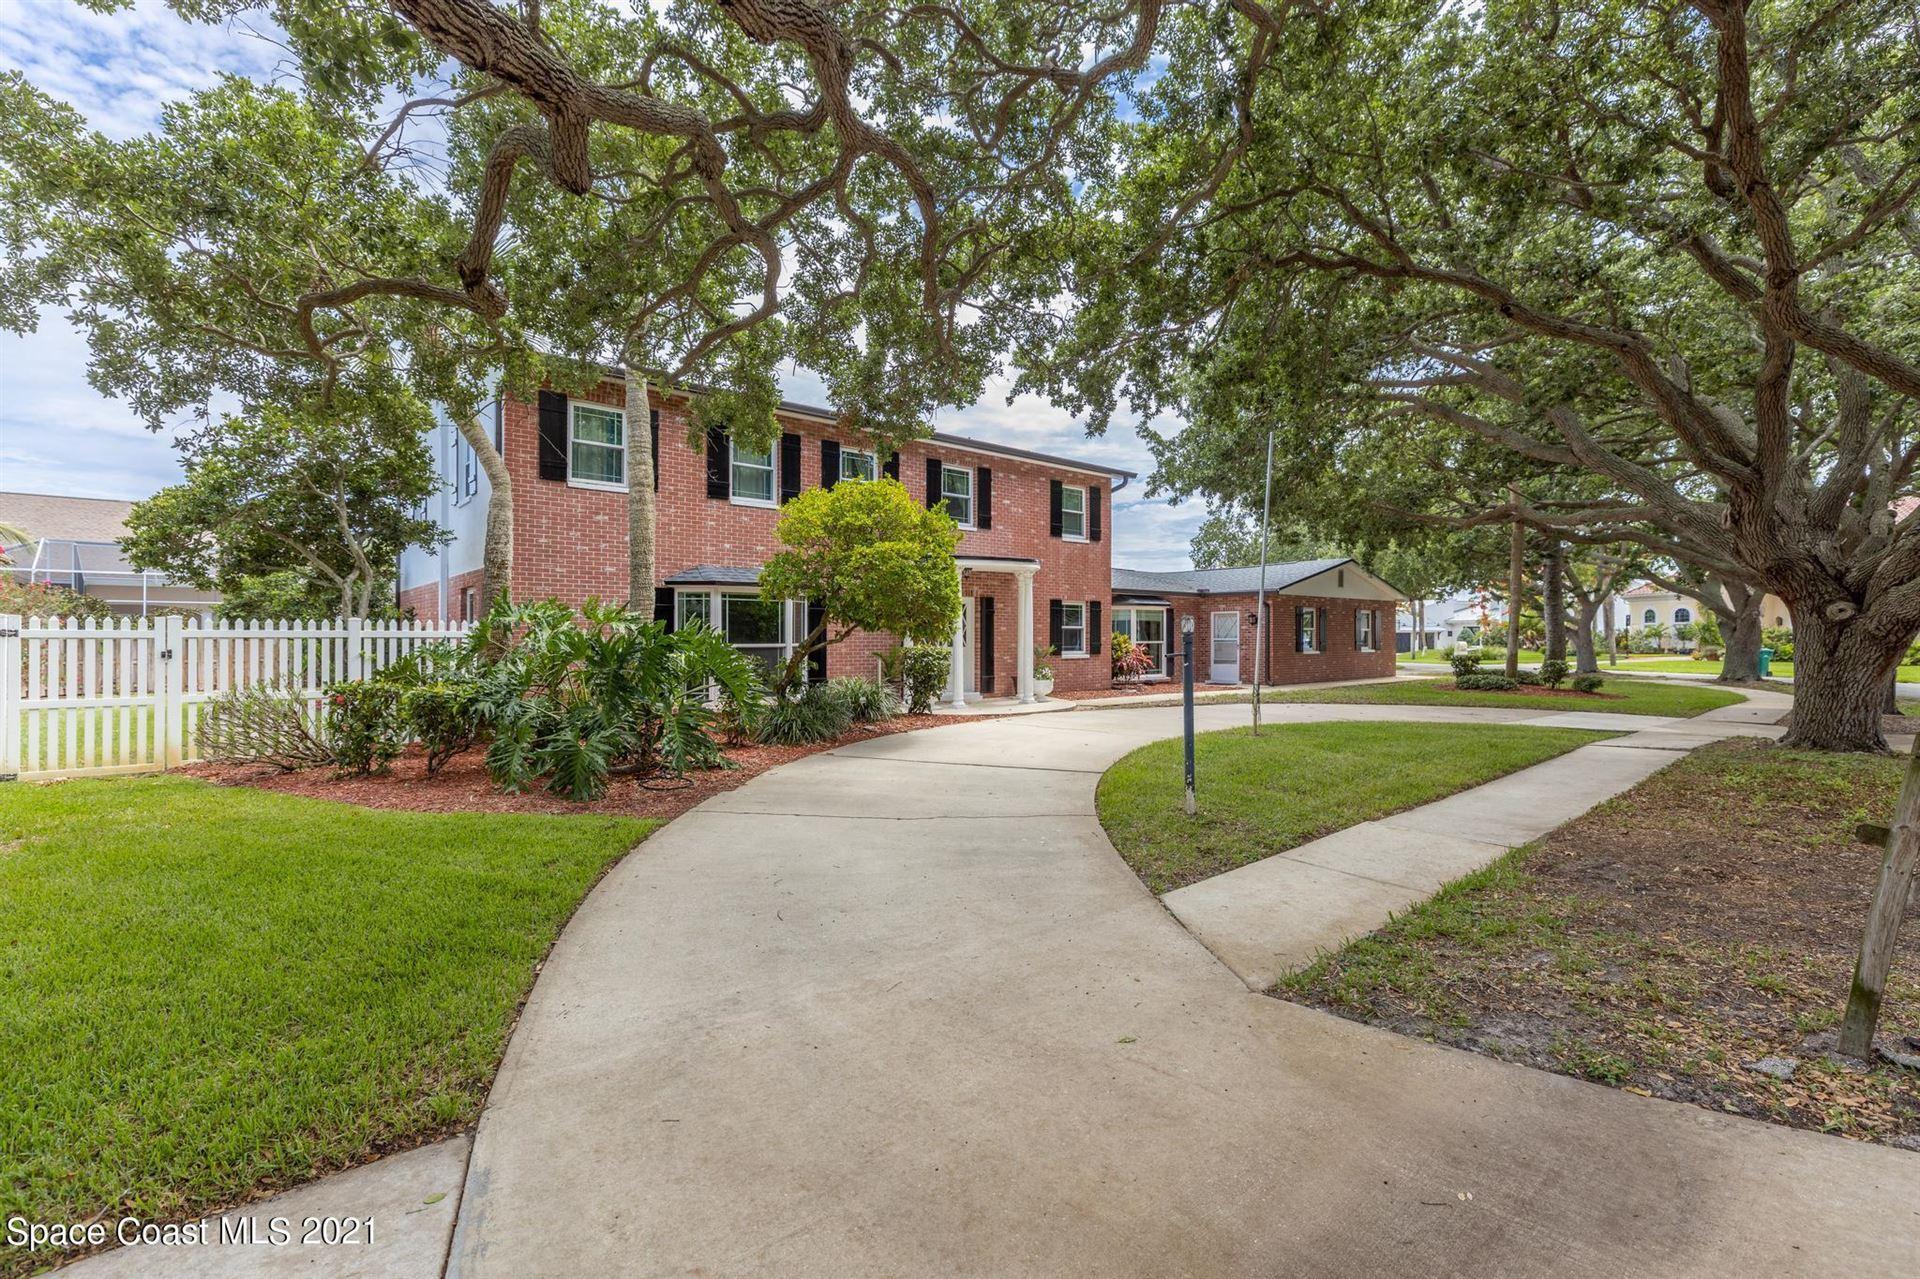 517 N River Oaks Drive, Indialantic, FL 32903 - #: 907259